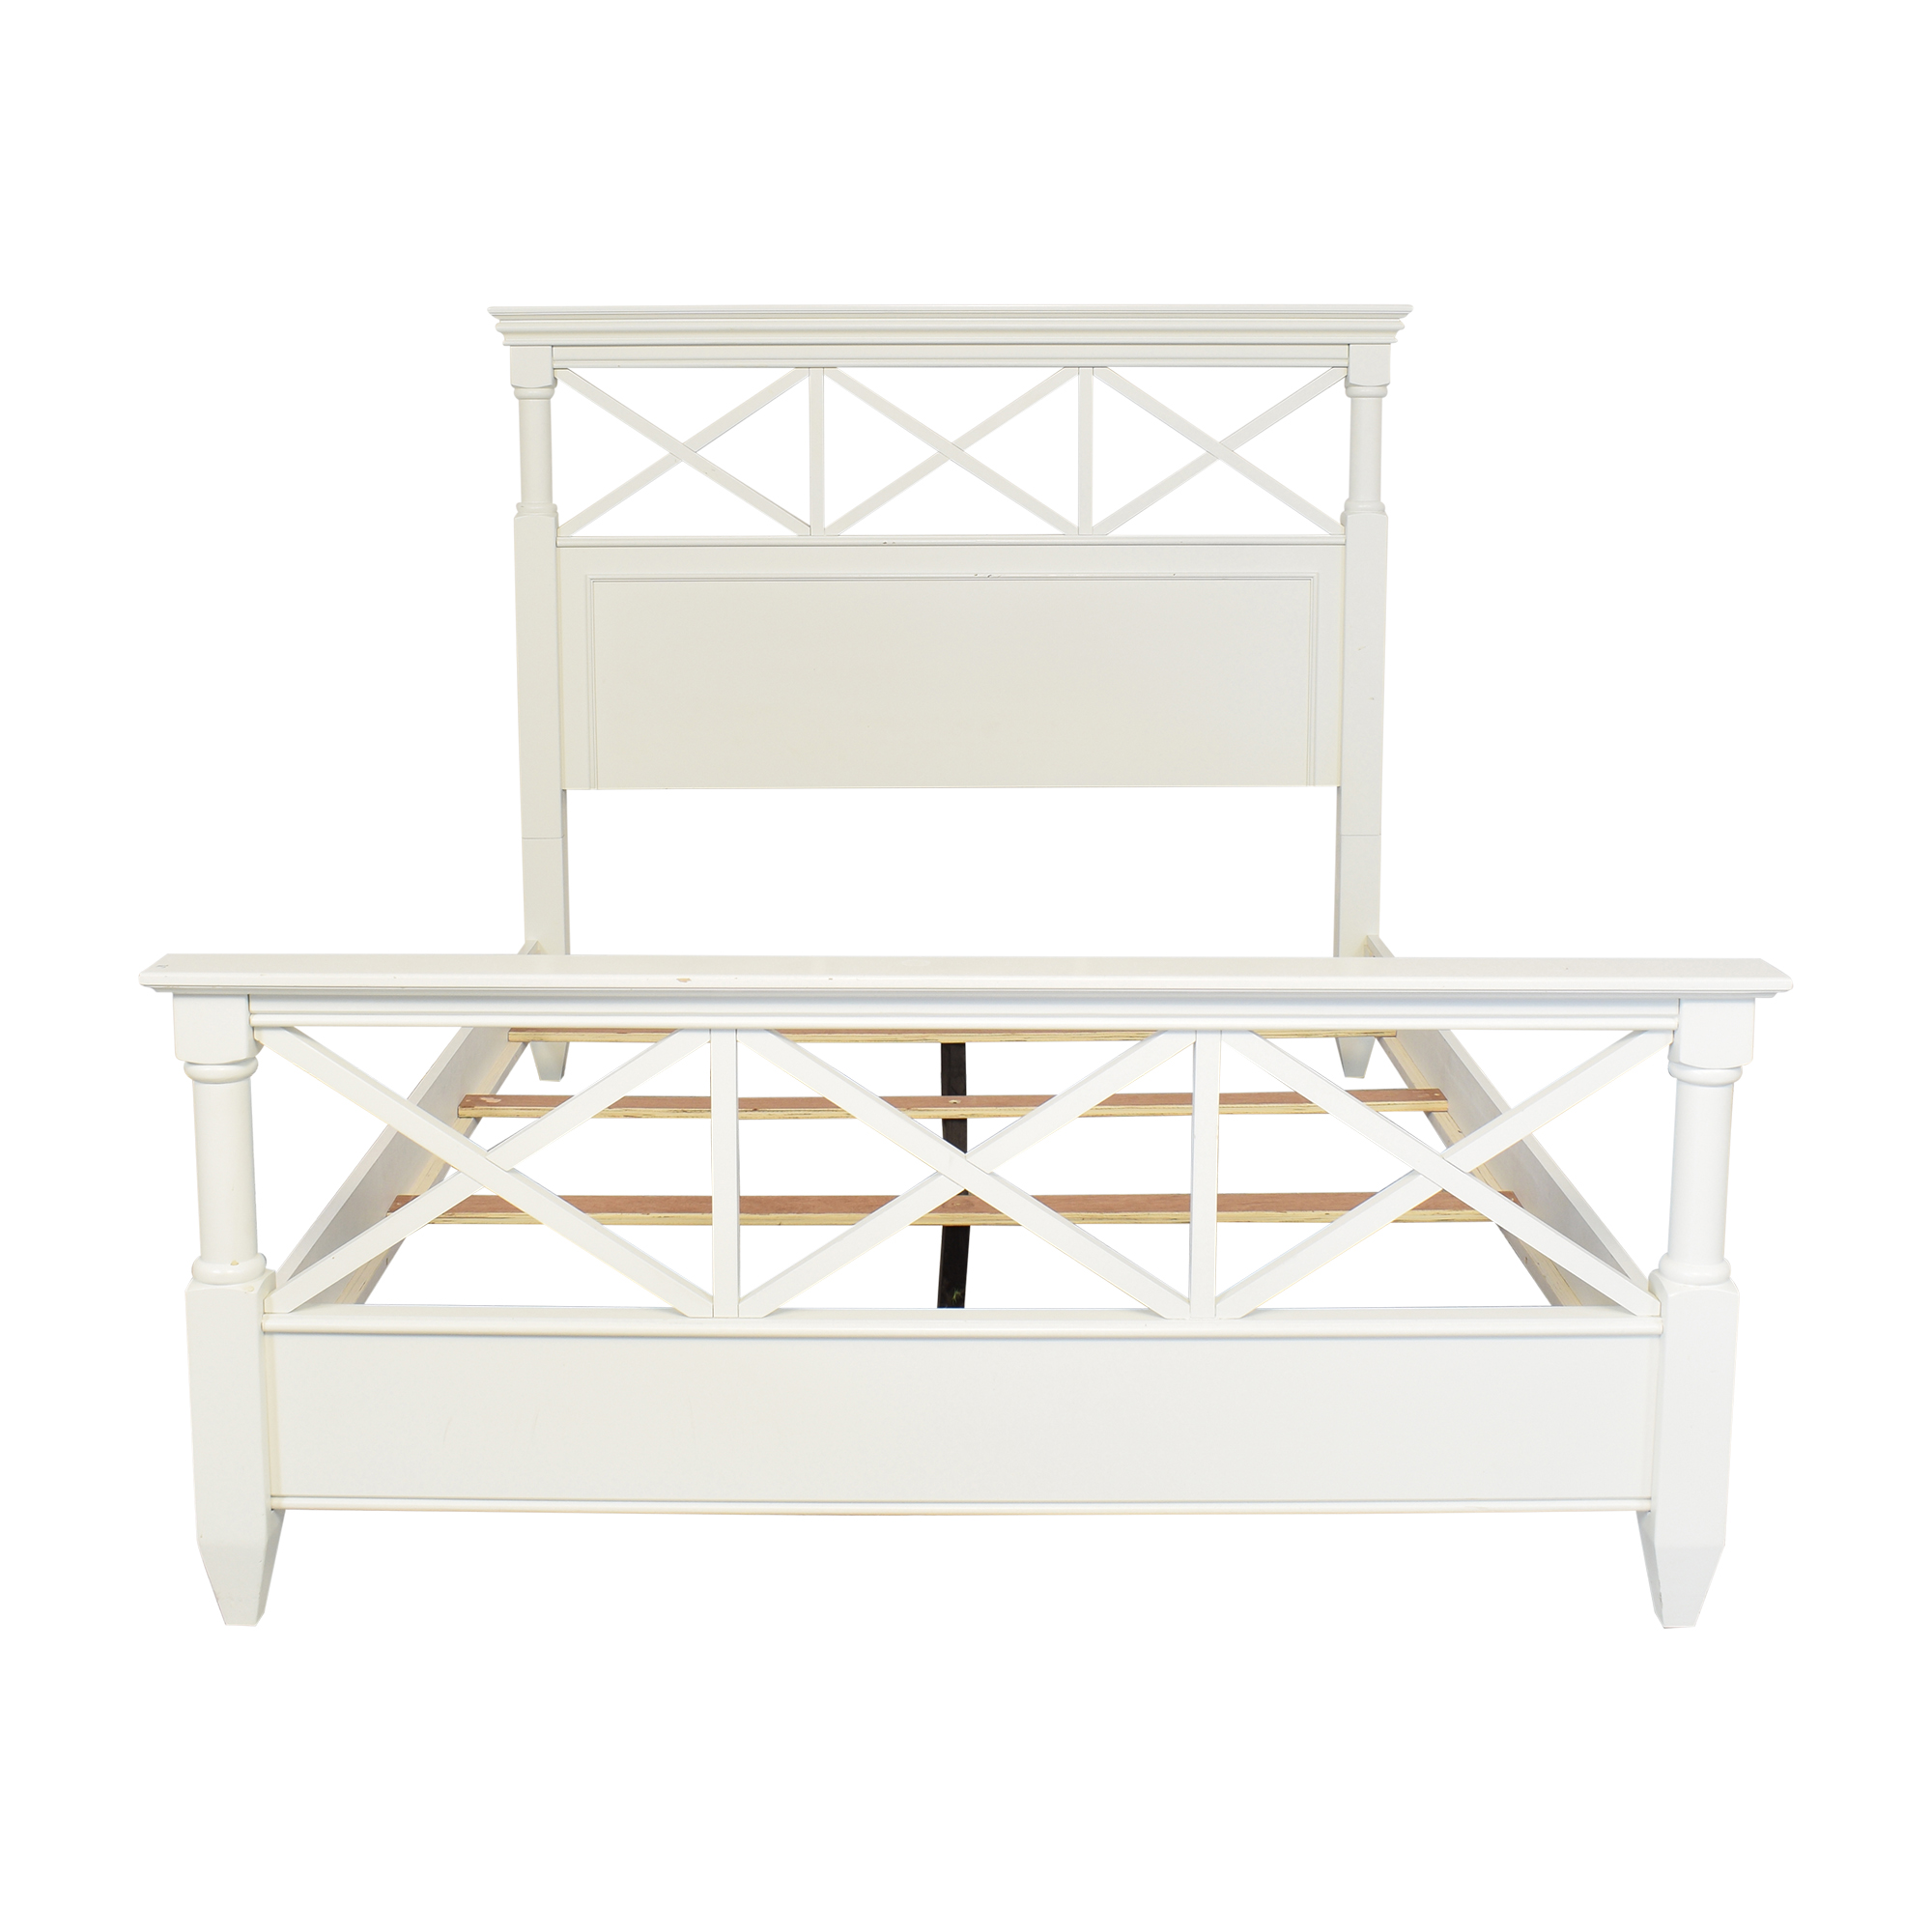 Magnussen Home Magnussen Home Queen Bed Frame dimensions